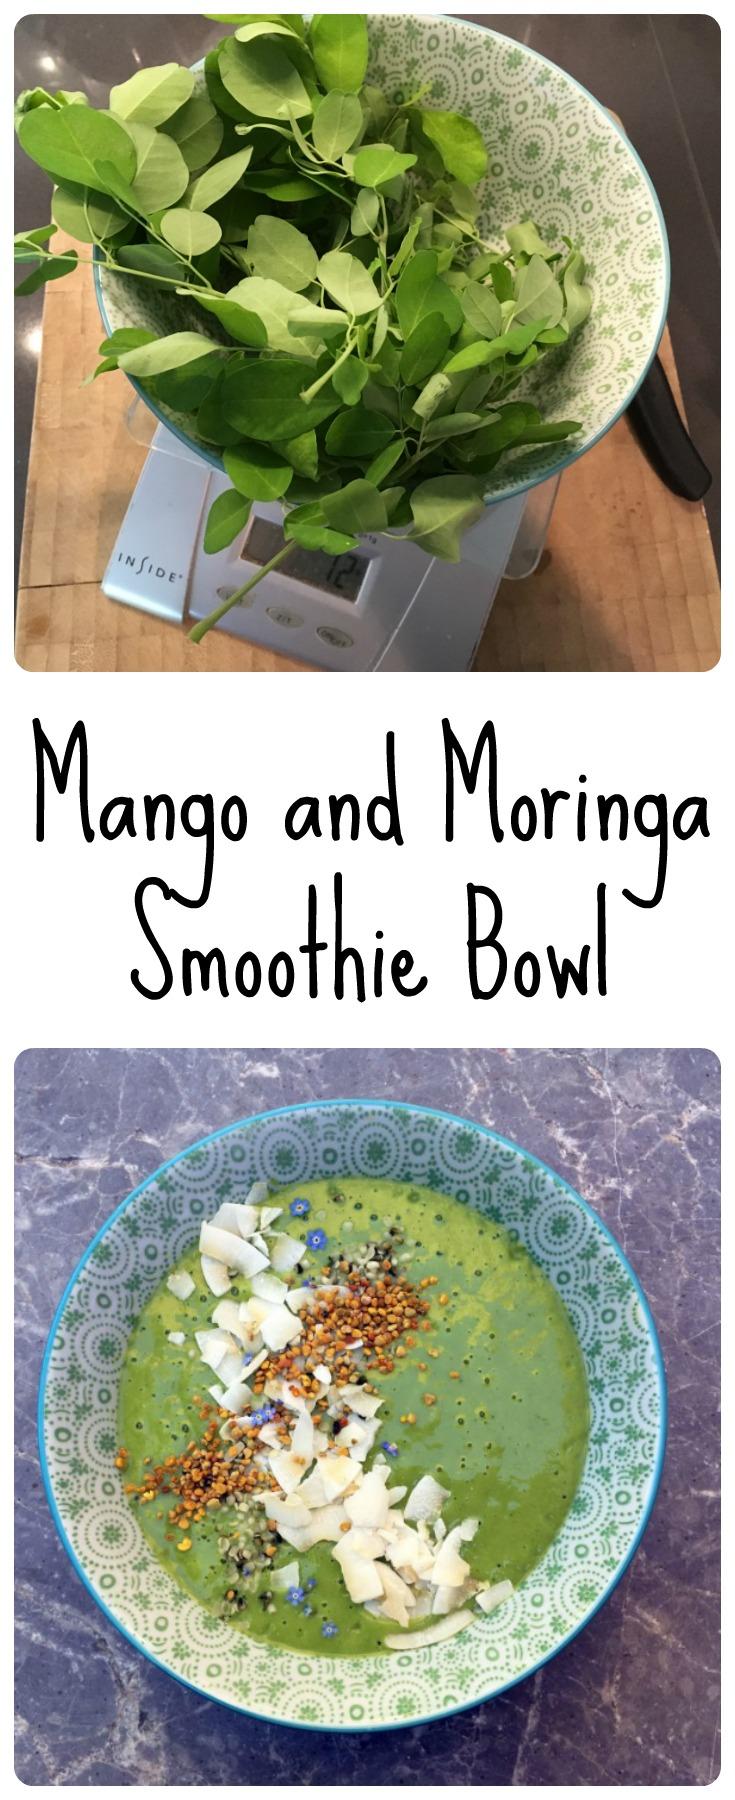 Mango and Moringa Smoothie Bowl - The HIstamine Friendly Kitchen